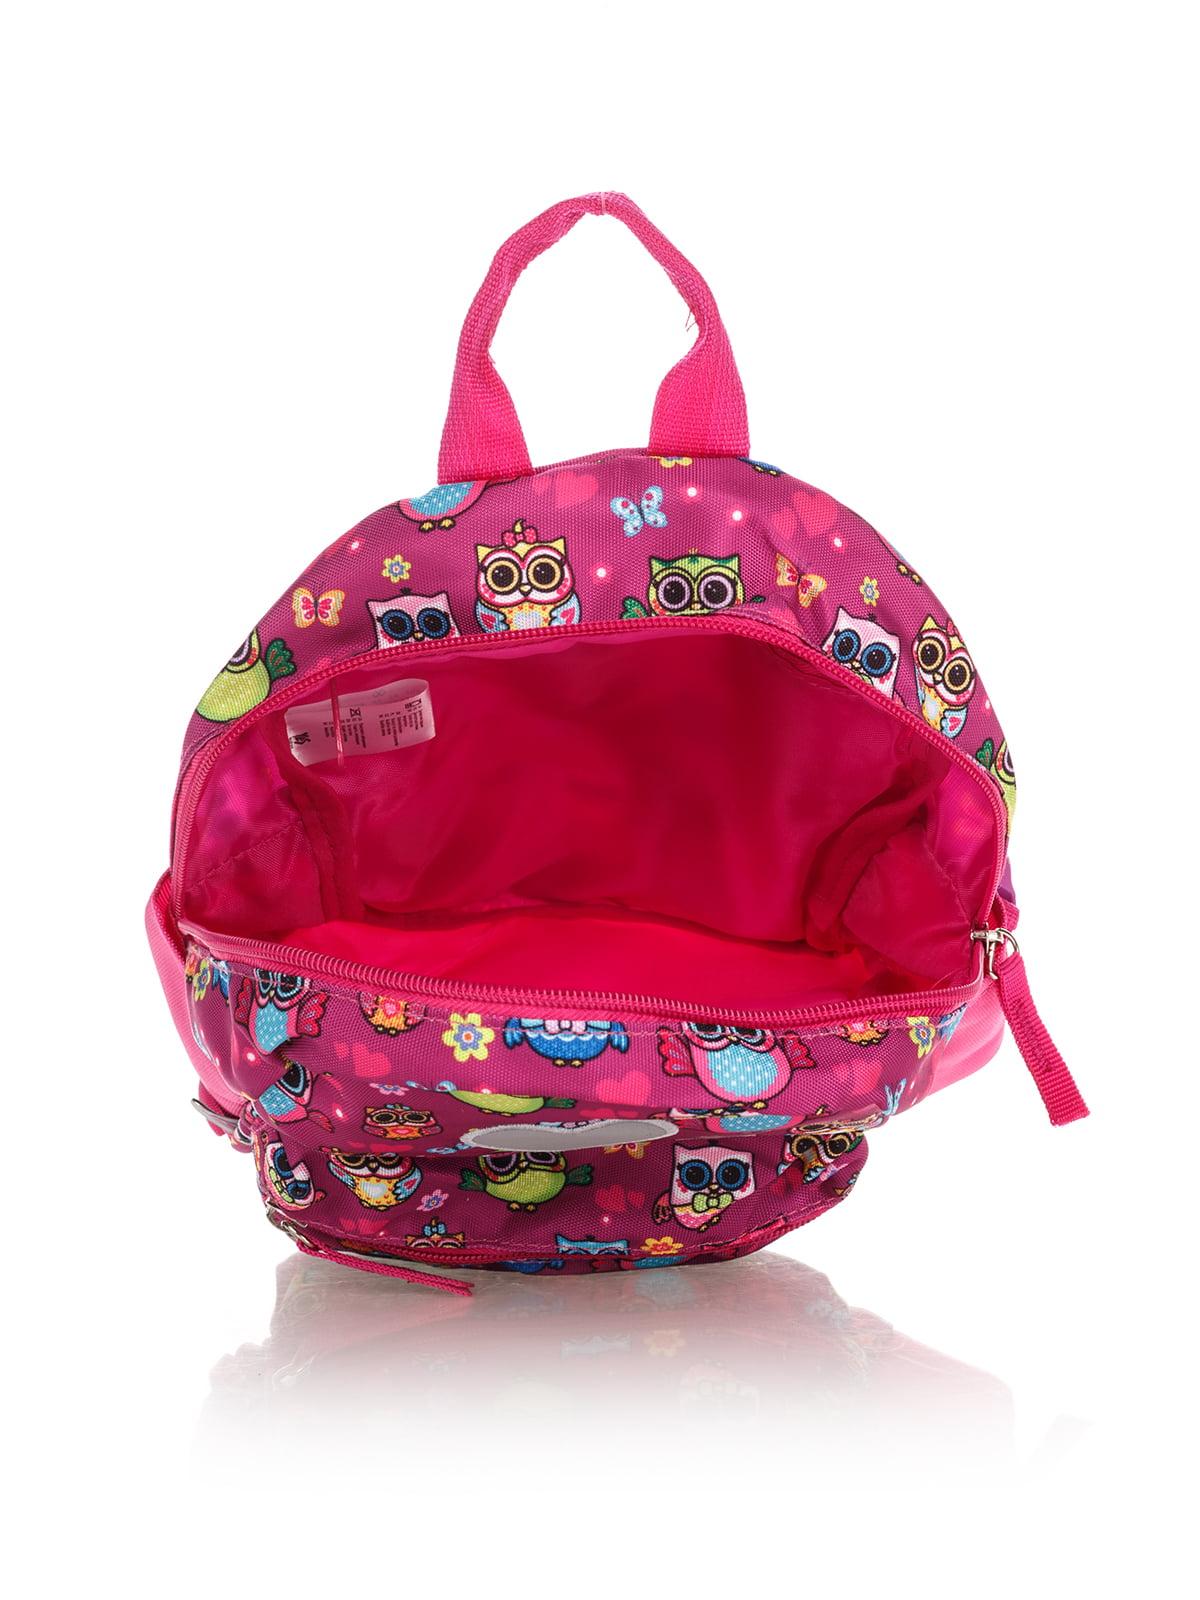 Рюкзак рожевий в принт | 4284719 | фото 4